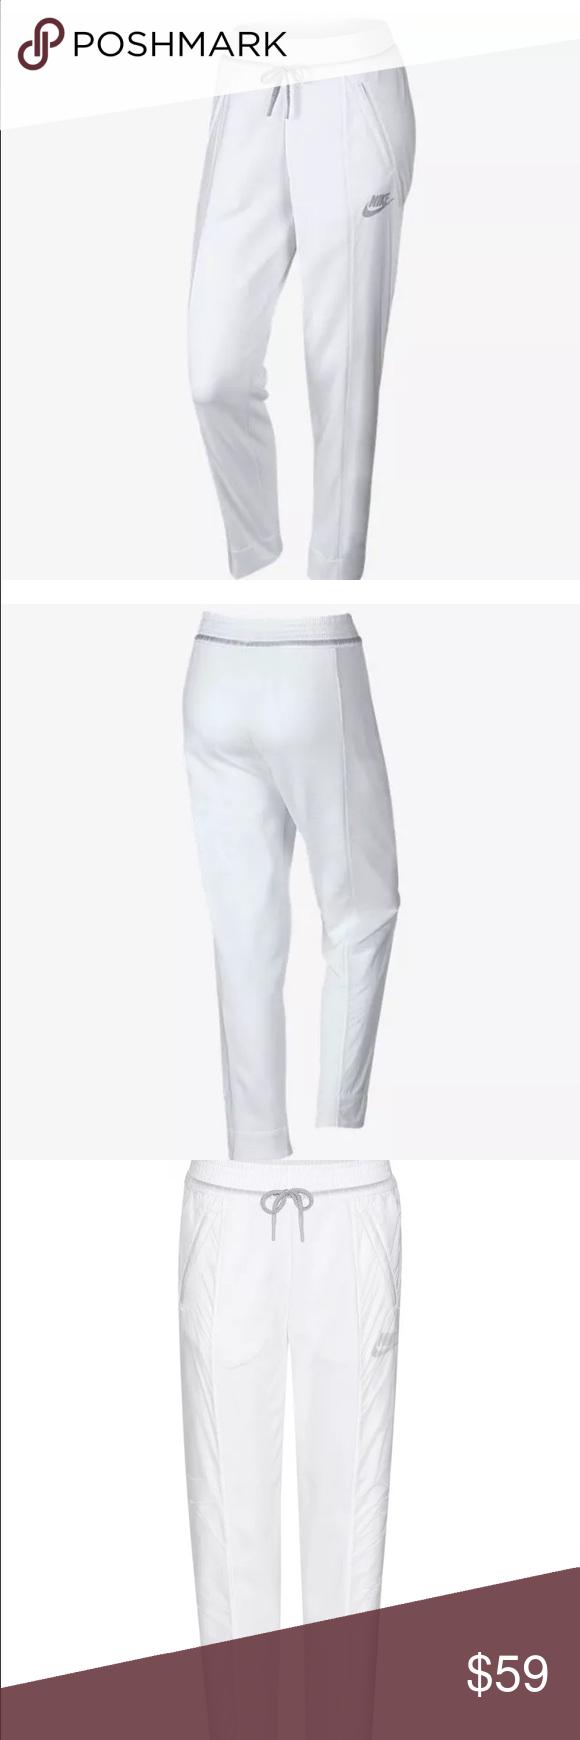 Nike Tech Fleece Splatter Womens Sweatpants Clothing Active